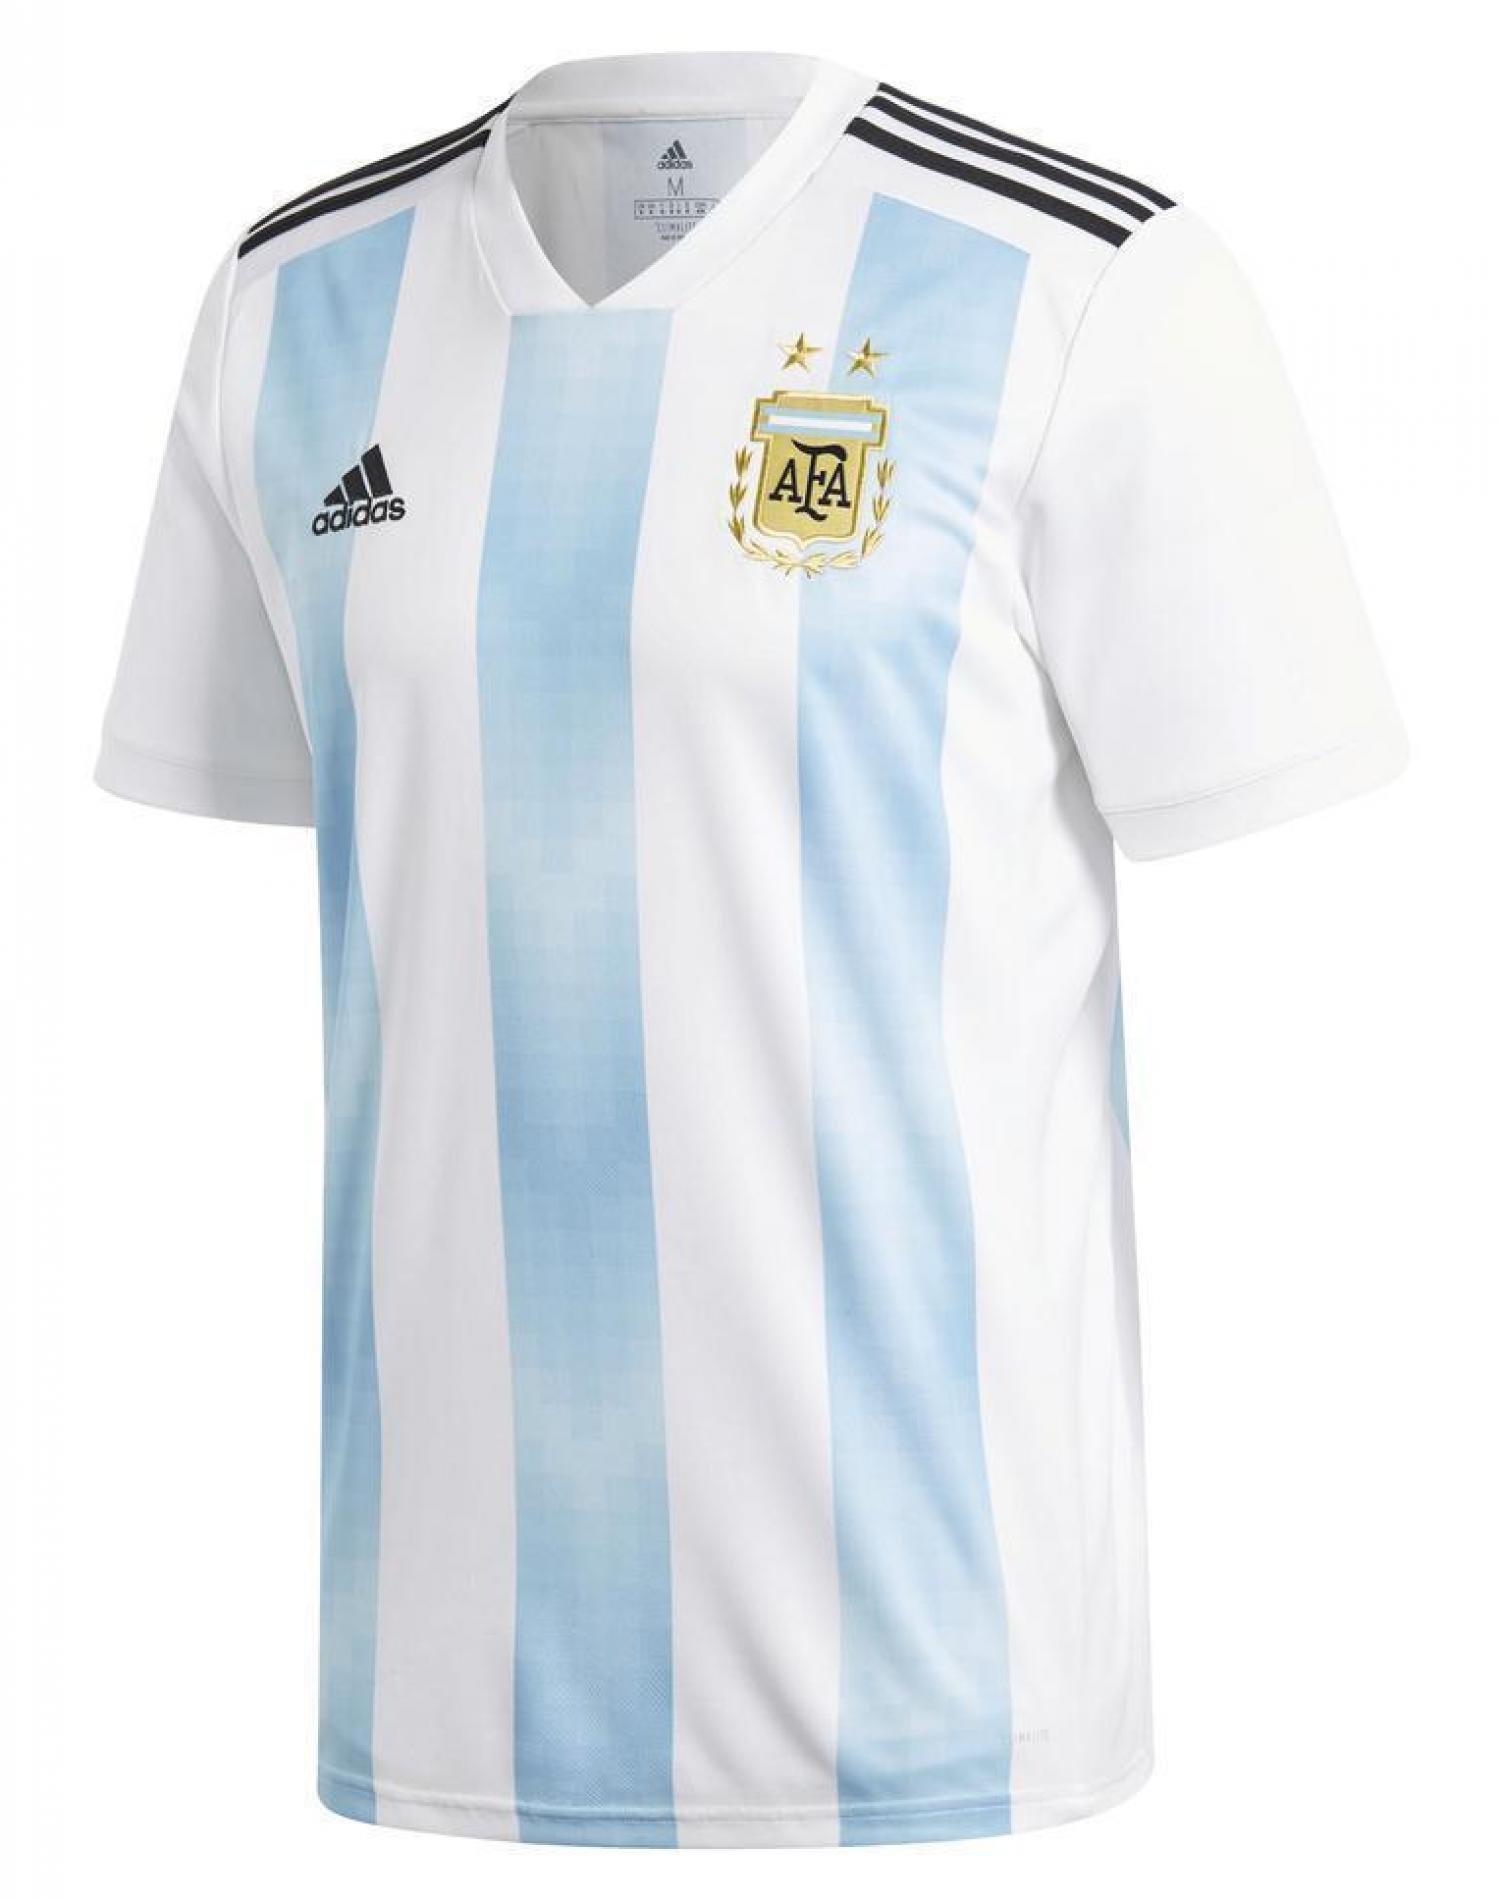 Camiseta Blanca Adidas AFA 2018